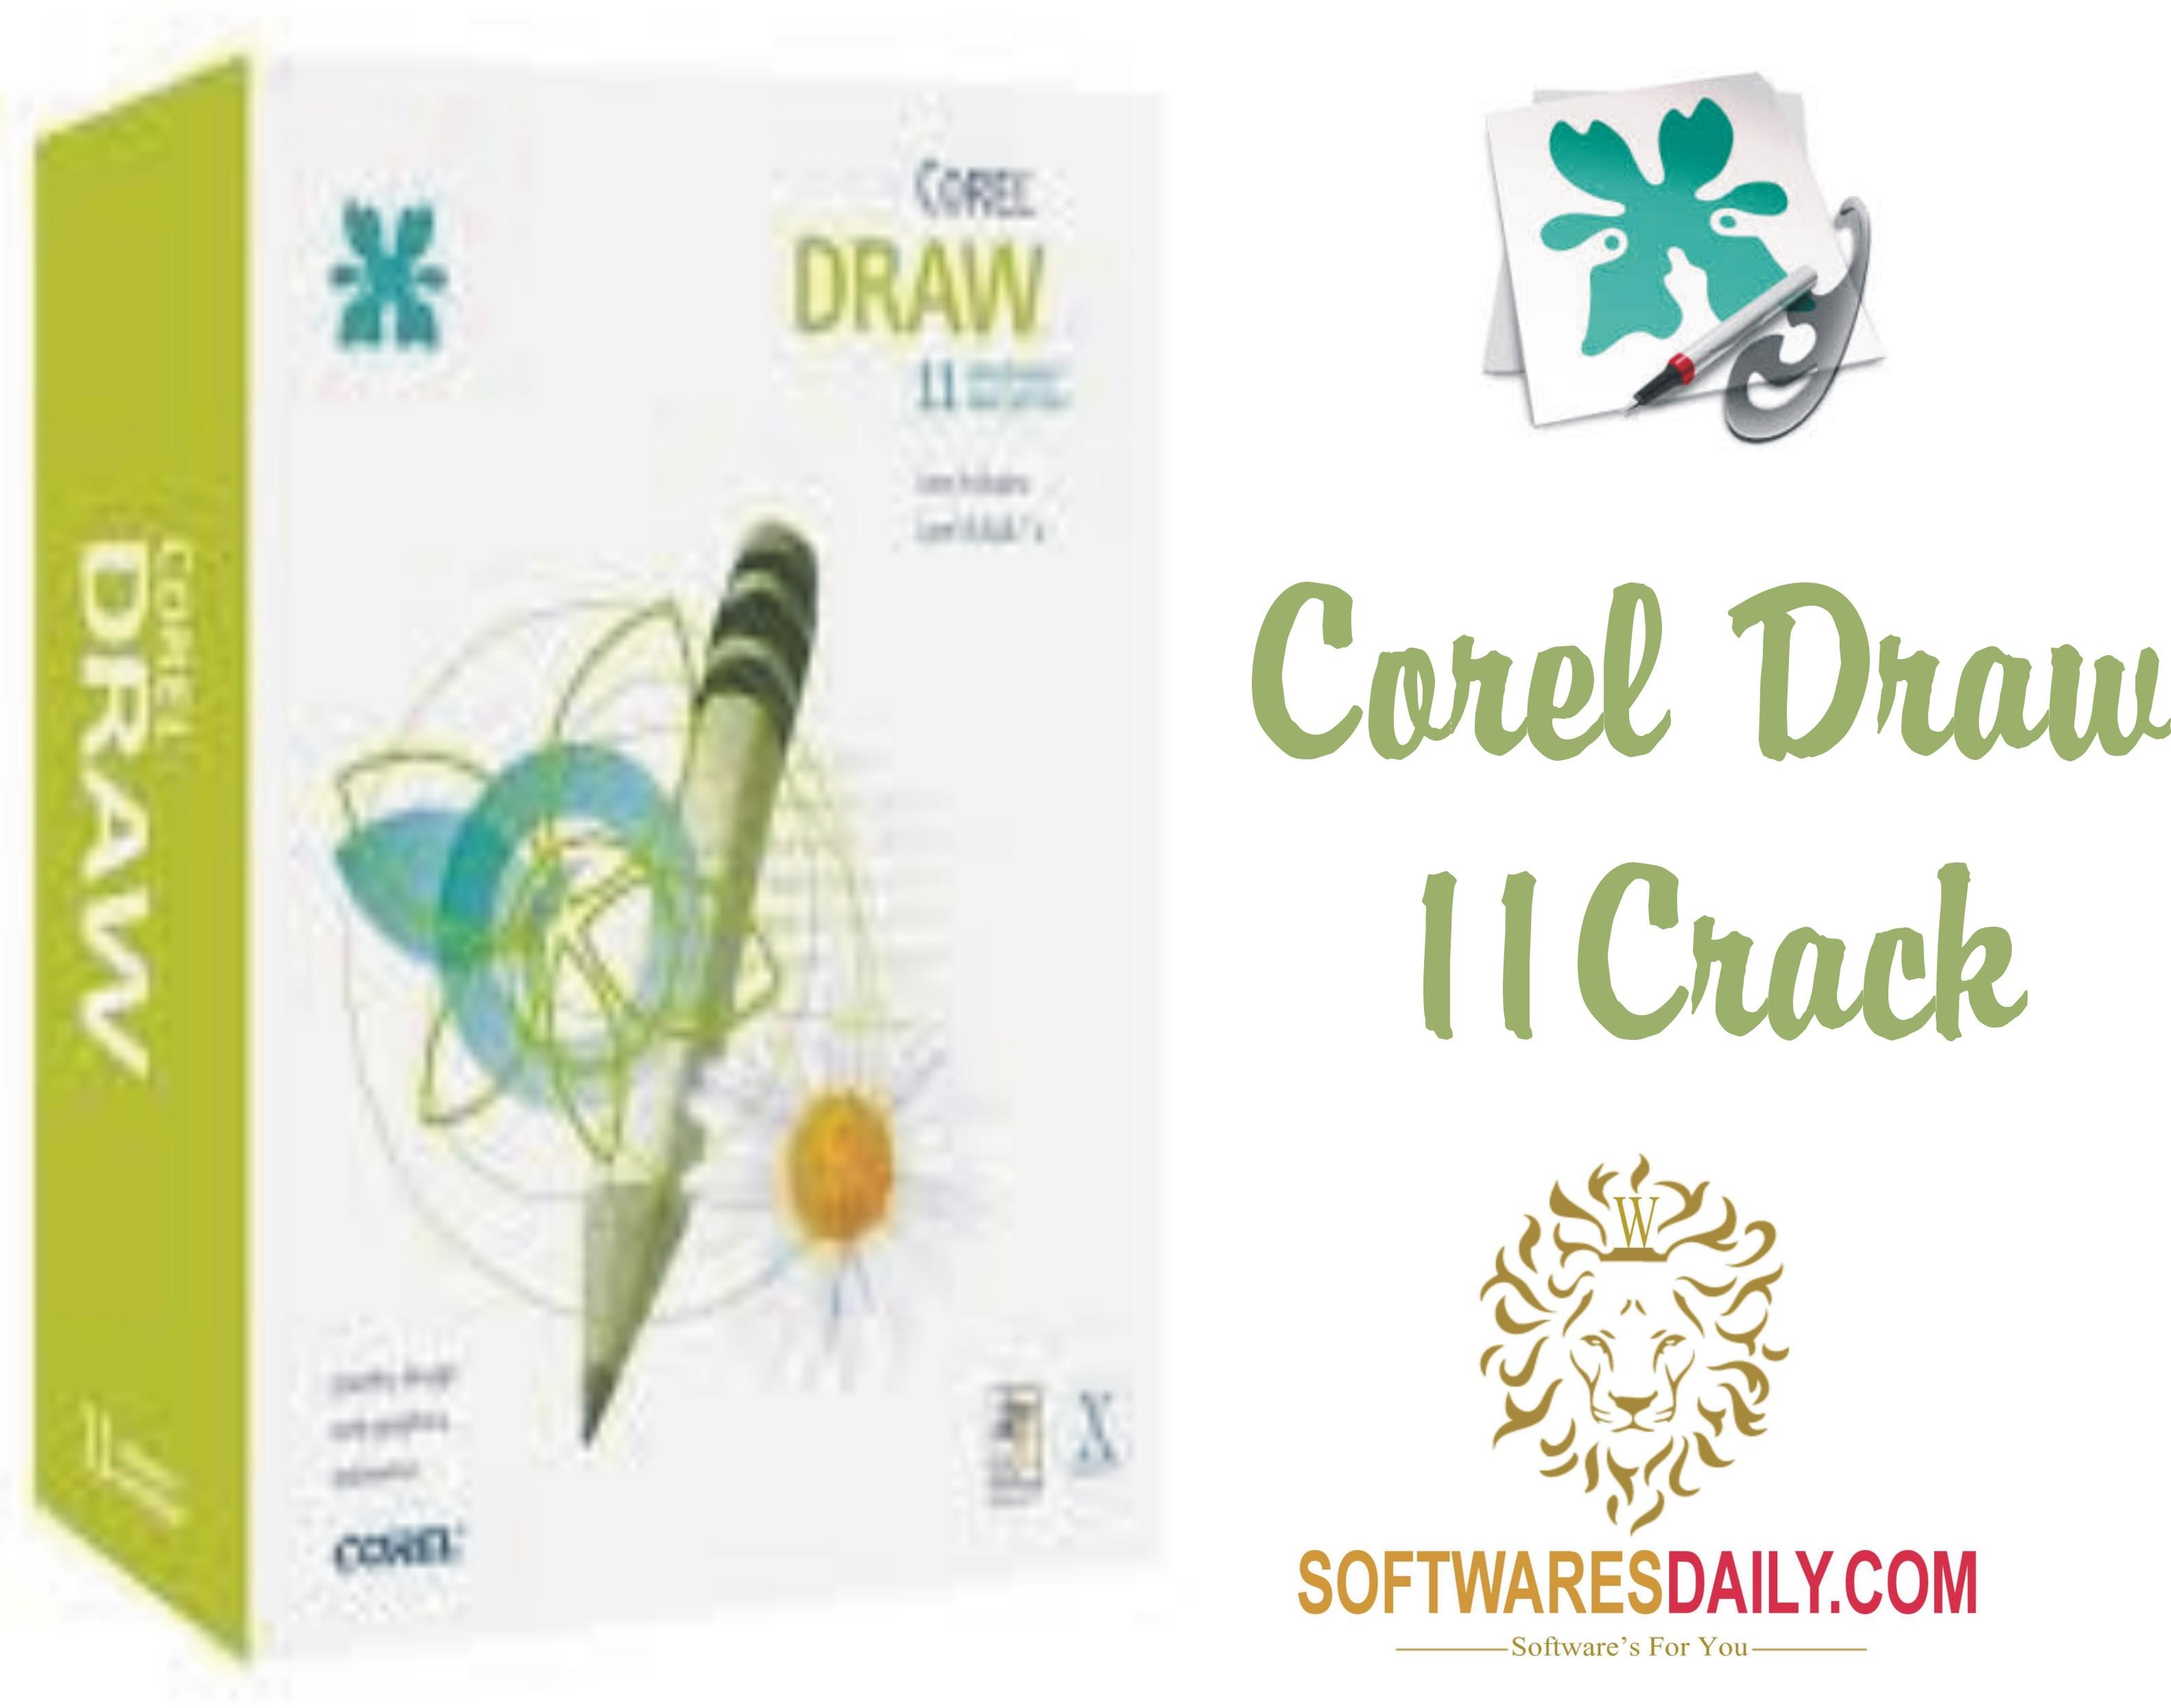 corel draw 11 crack